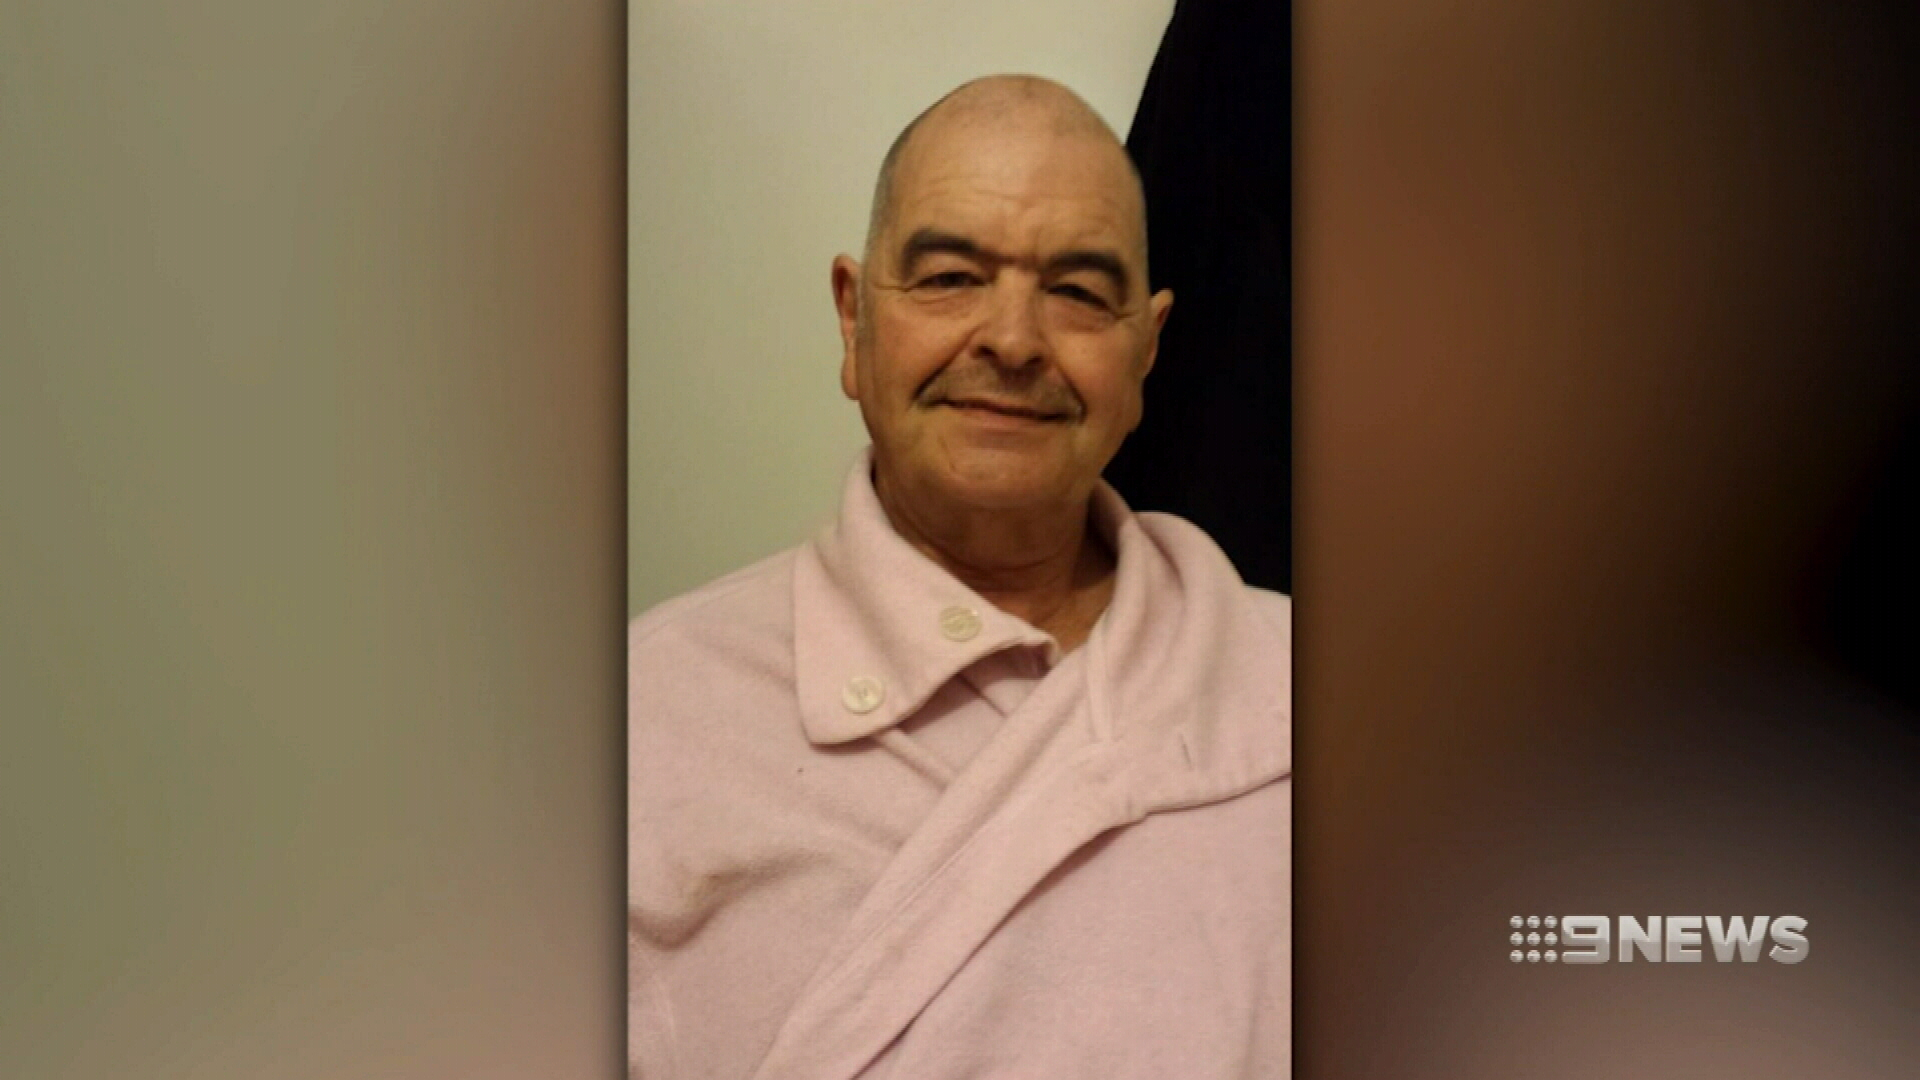 Wheelchair-bound father found dead at home